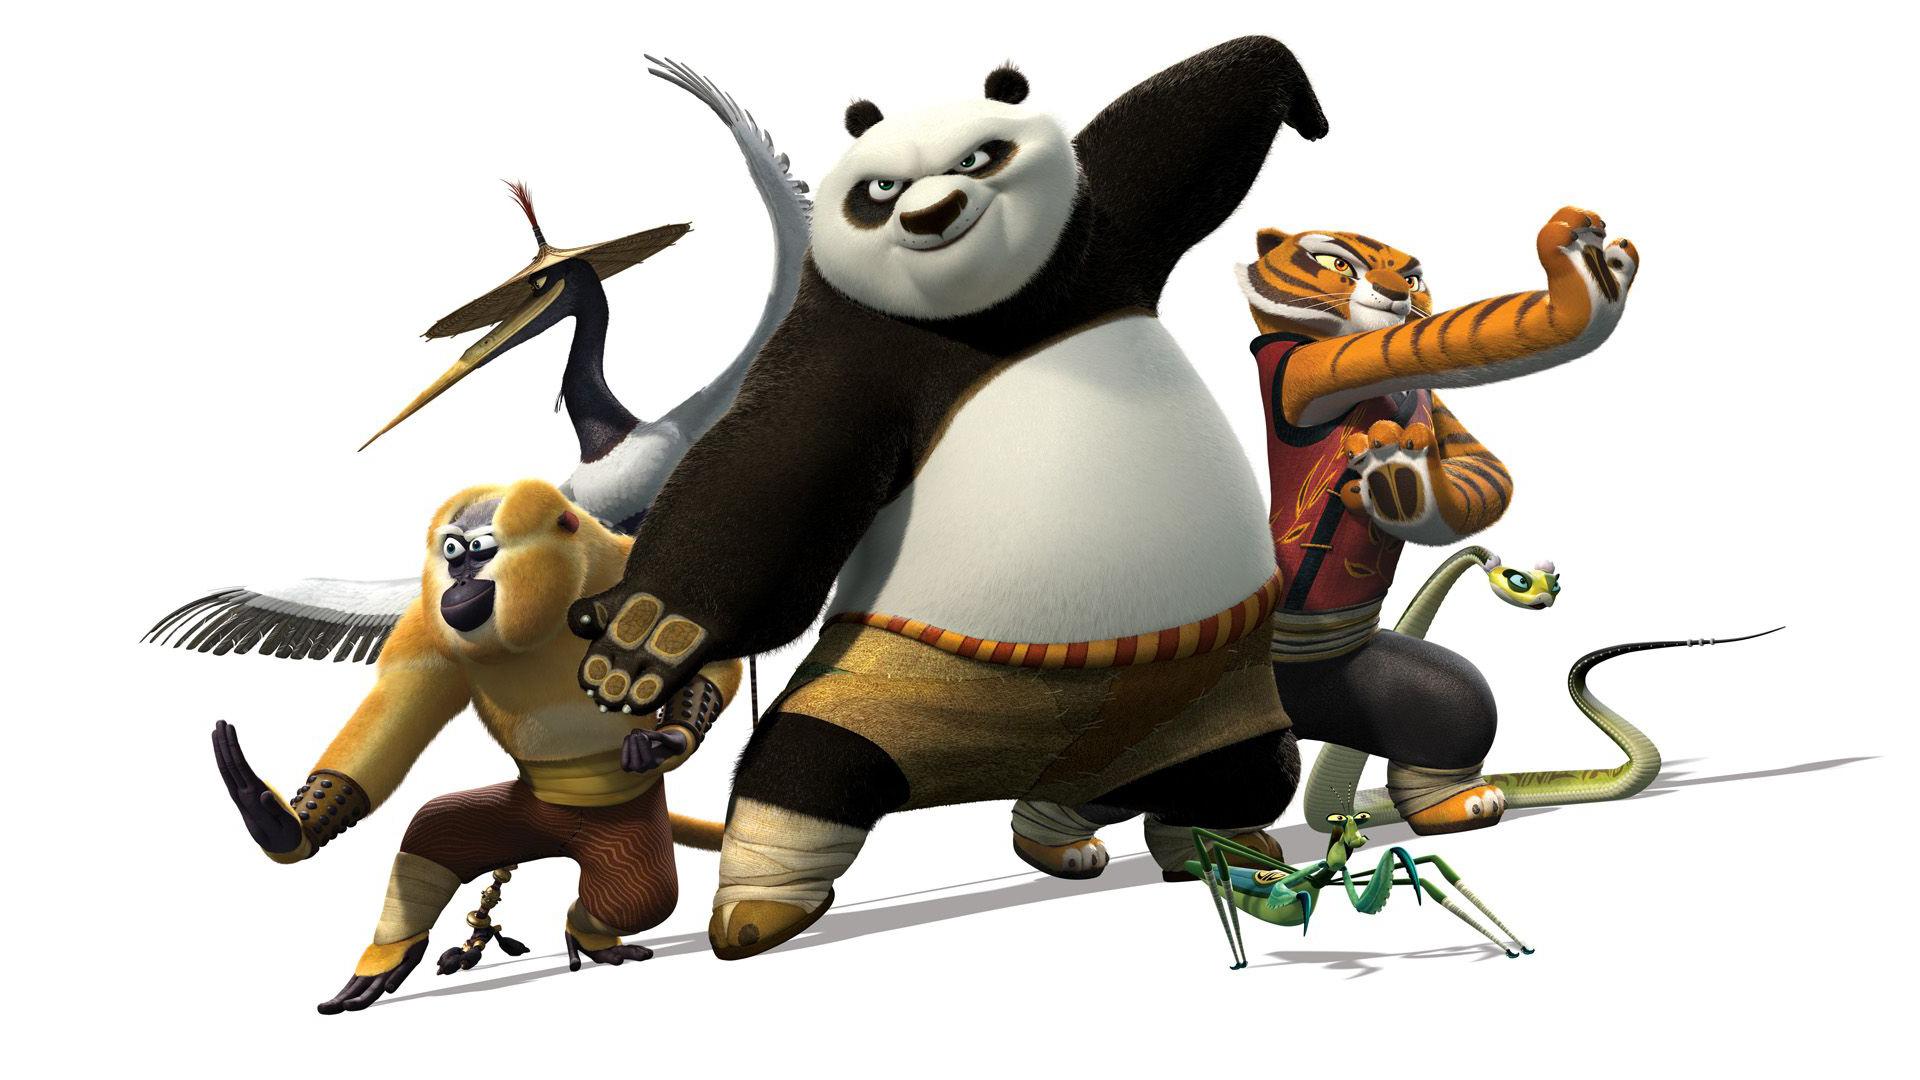 Kung fu panda full movie in hindi free download 3gp createlivin.